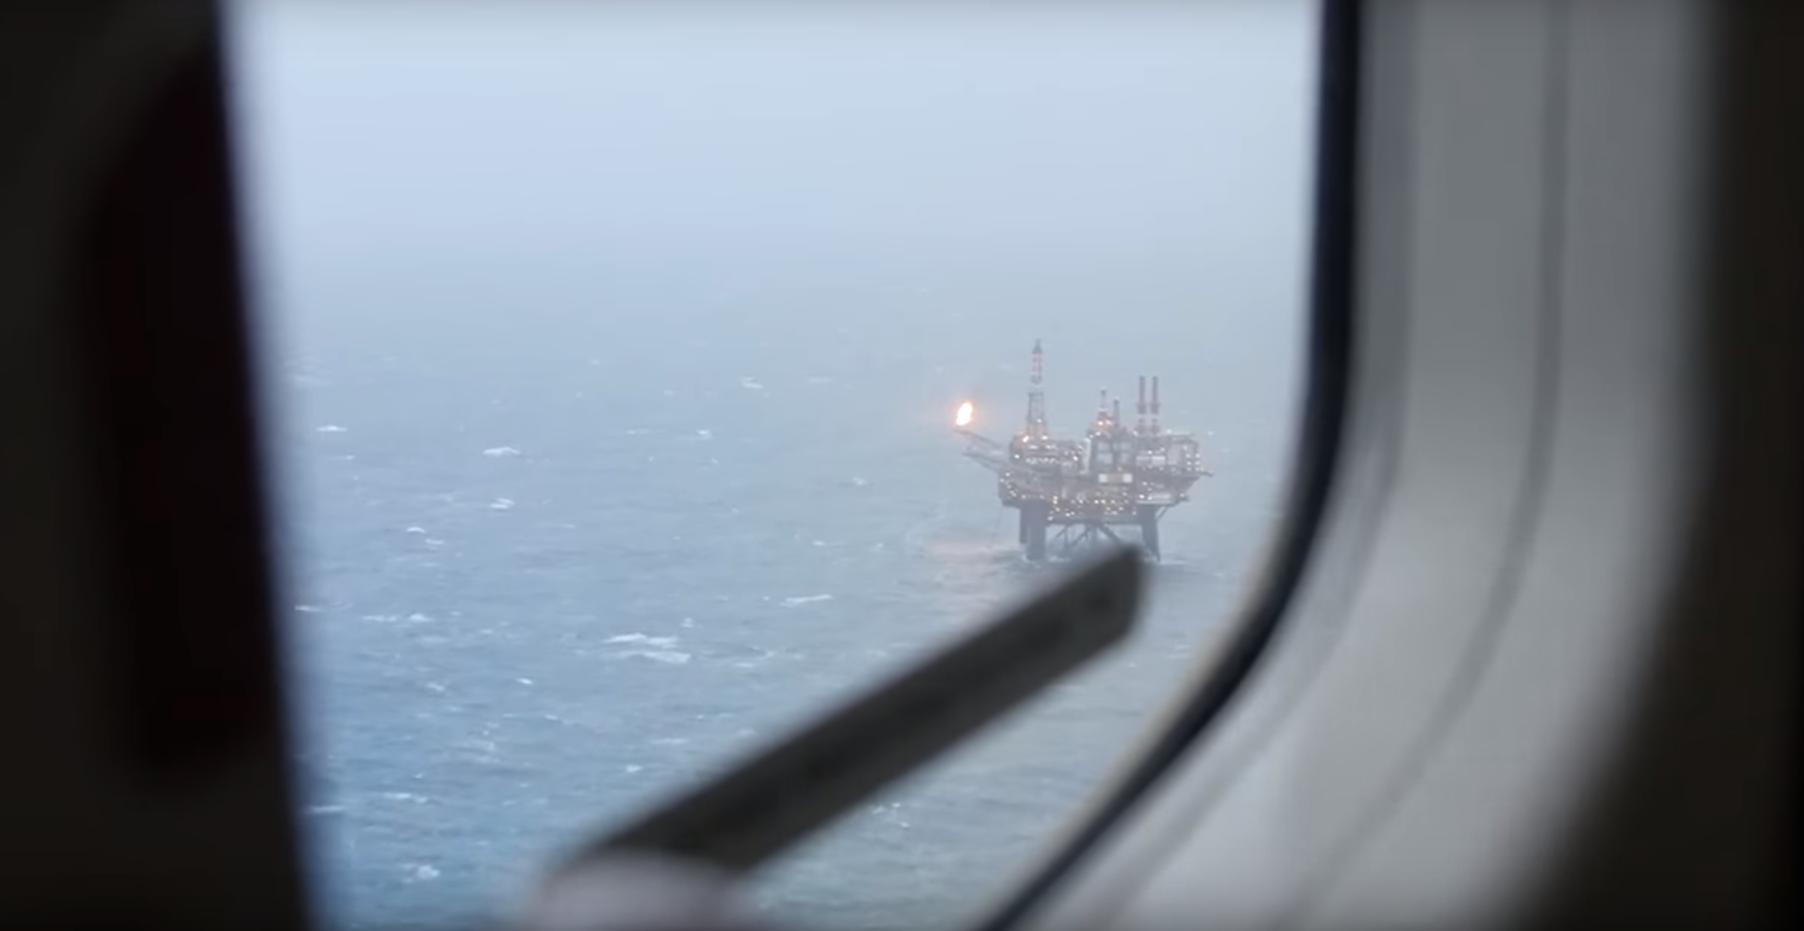 Video: Head at sea, heart at  home